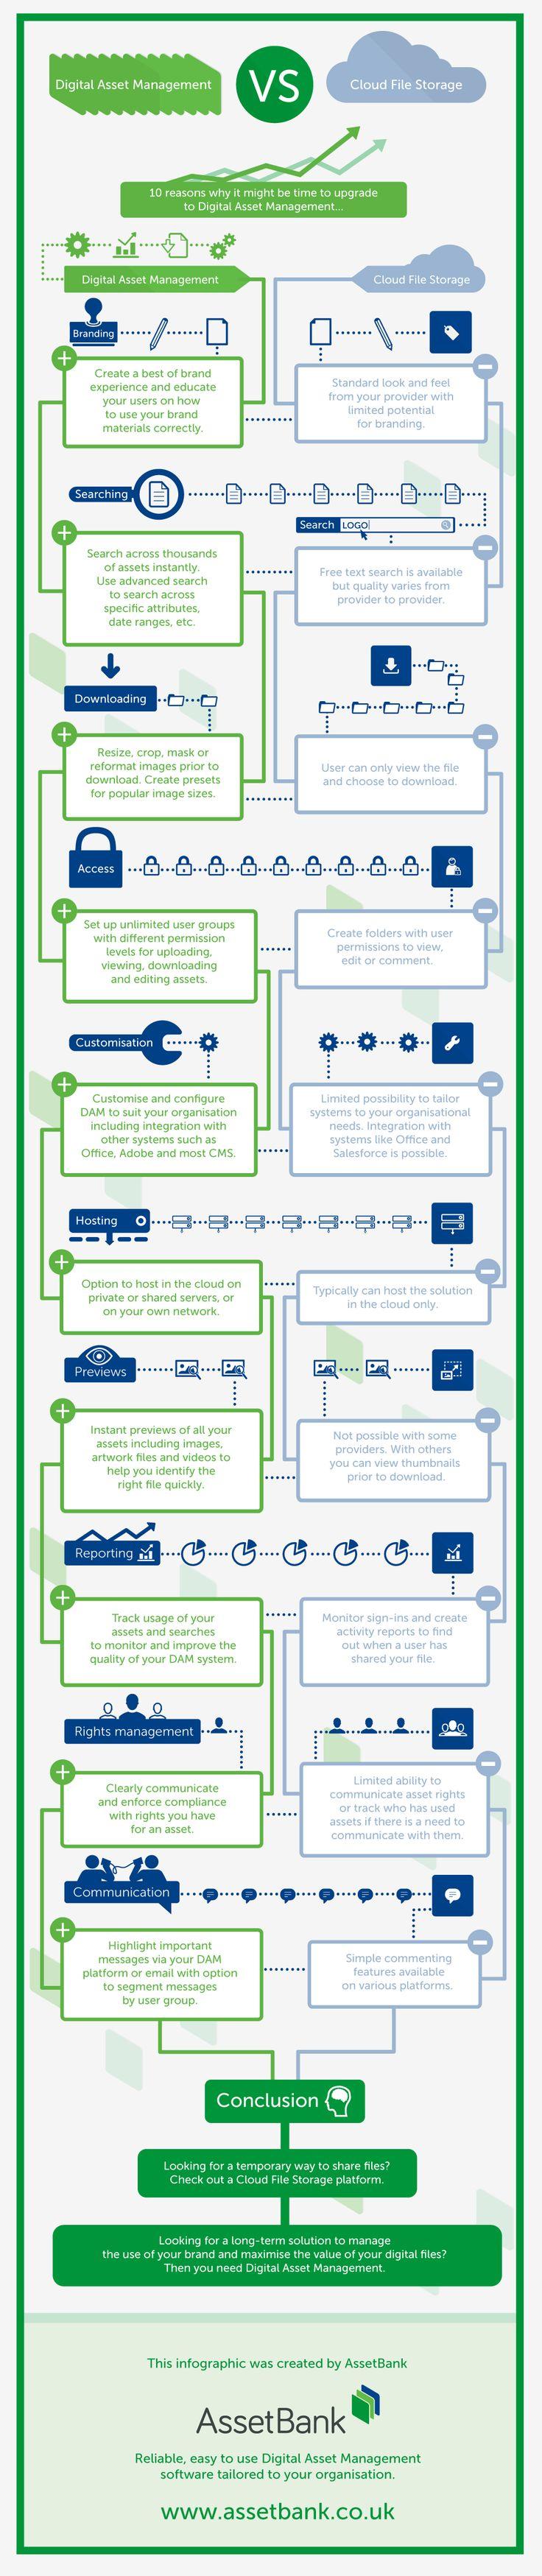 Digital Asset Management vs. Cloud File Storage #infographic #Business #Storage #Technology